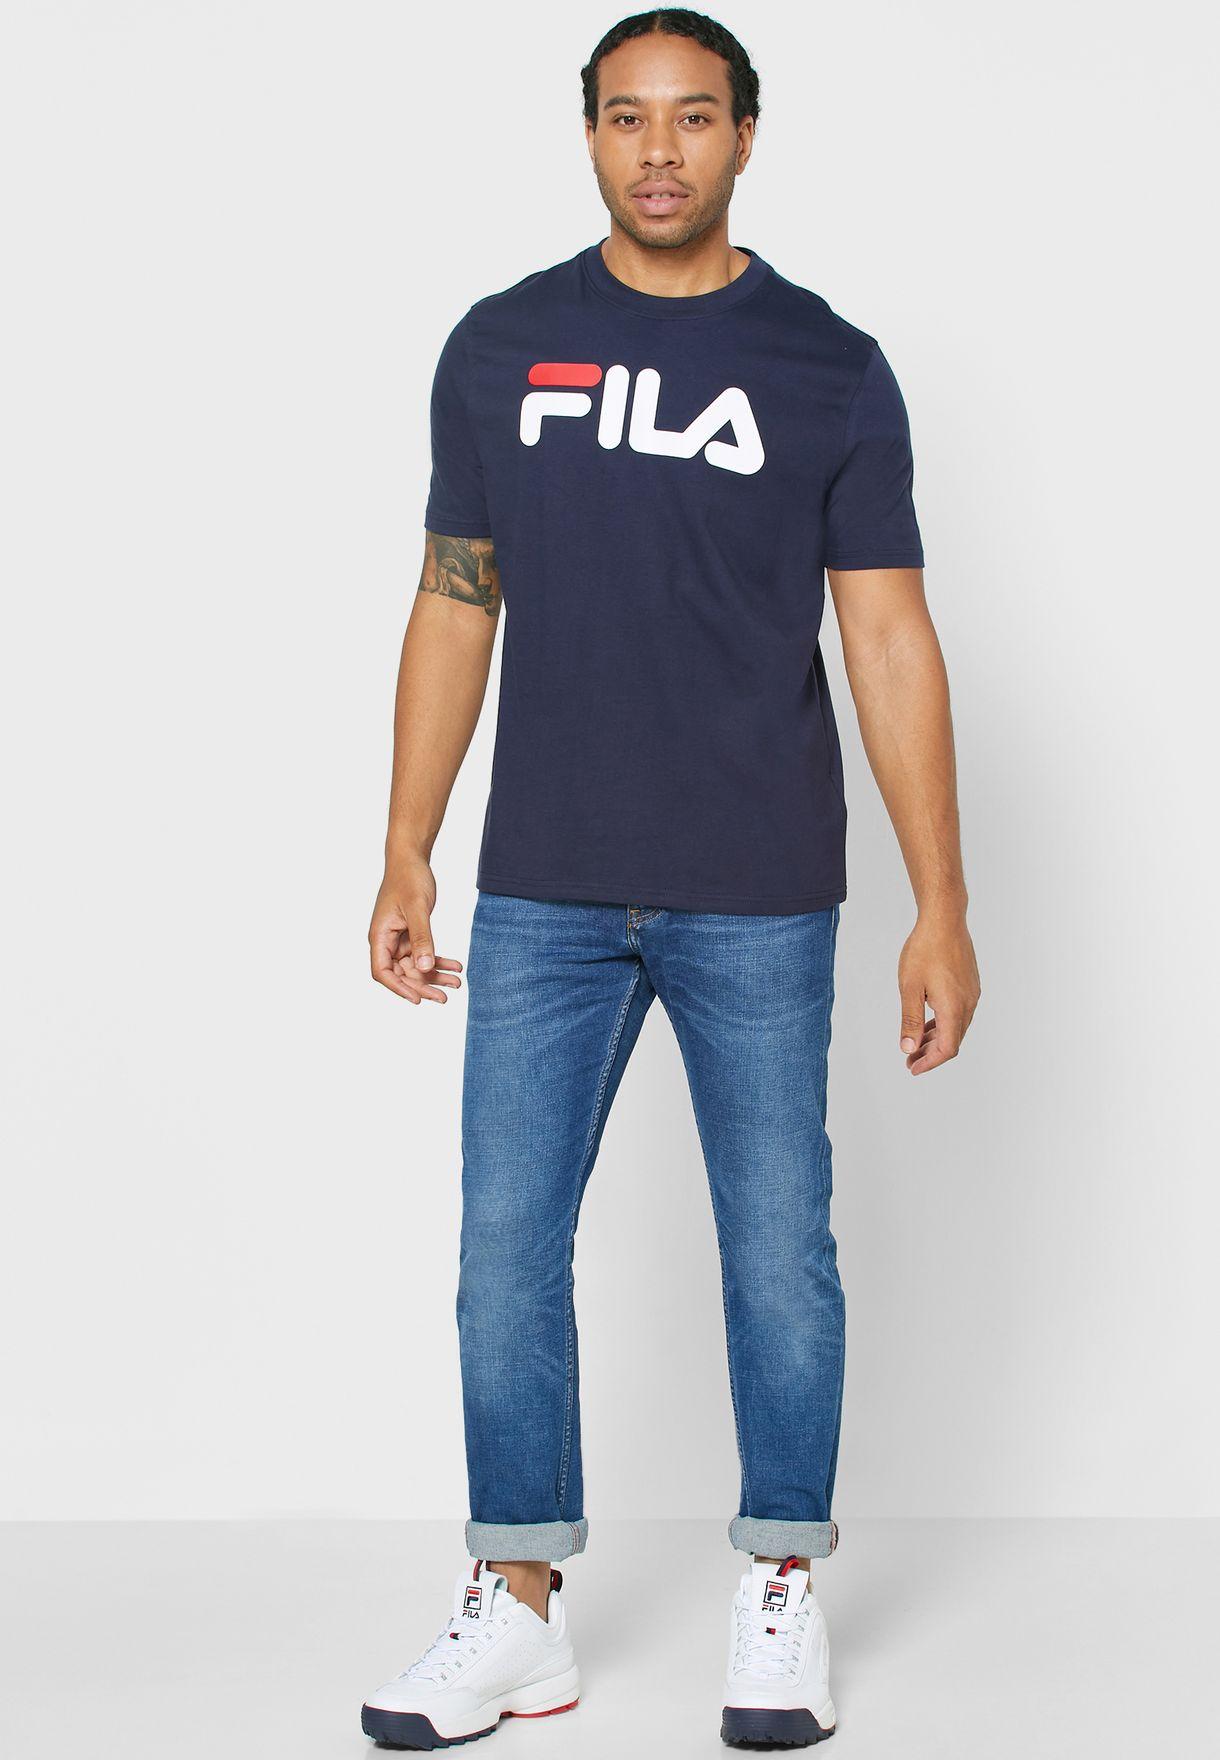 Eagle Graphic T-Shirt